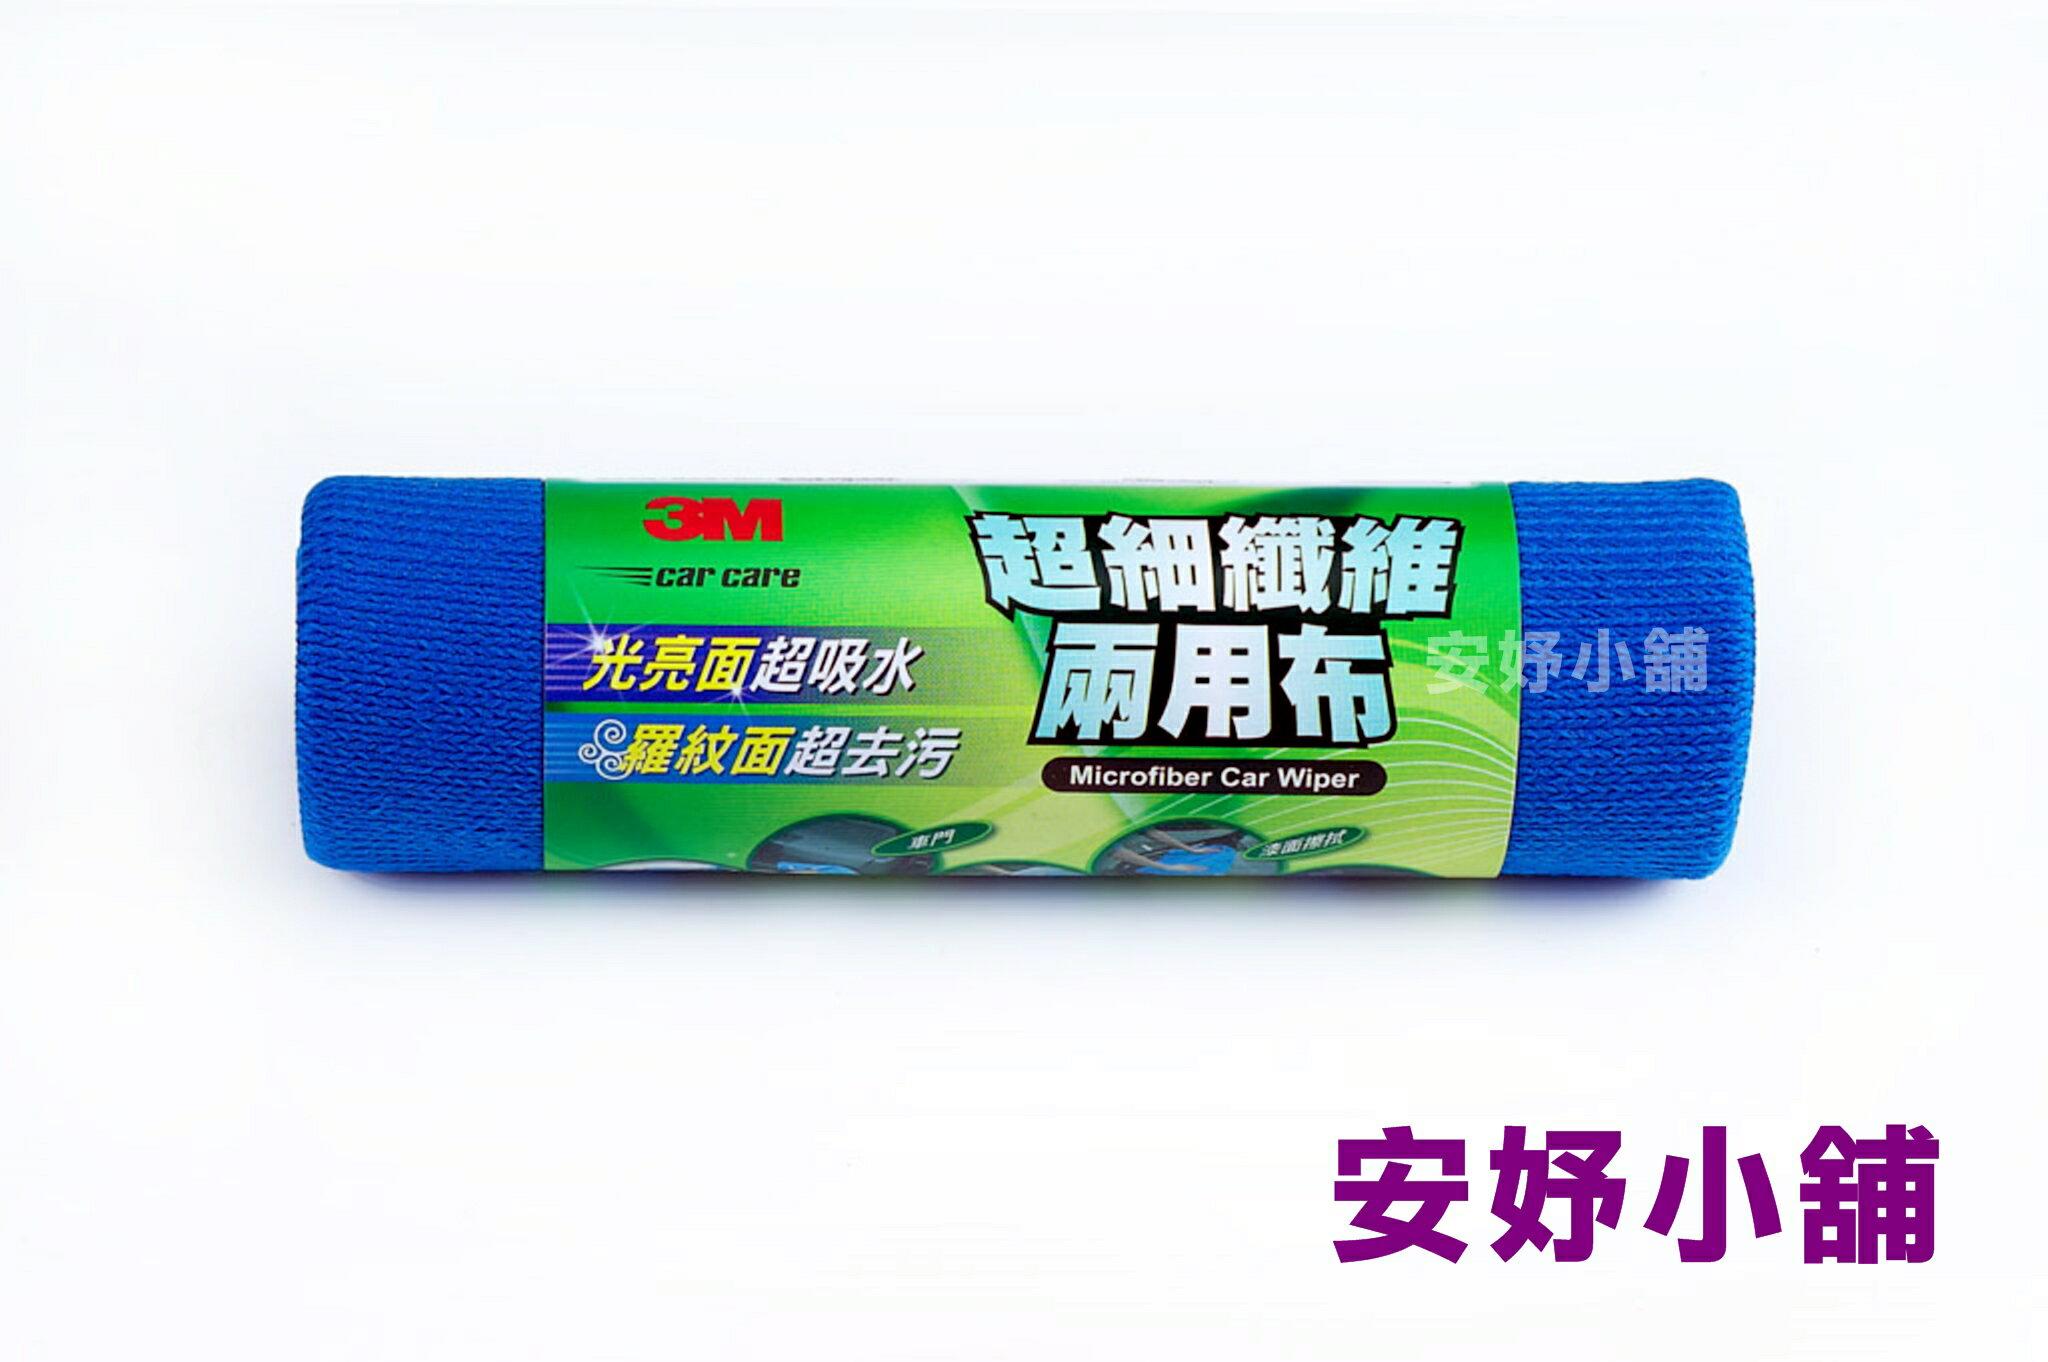 3M PN38201 超細纖維兩用布 38201 (30x30cm) 超細纖維布 超細纖維抹布 安妤小舖